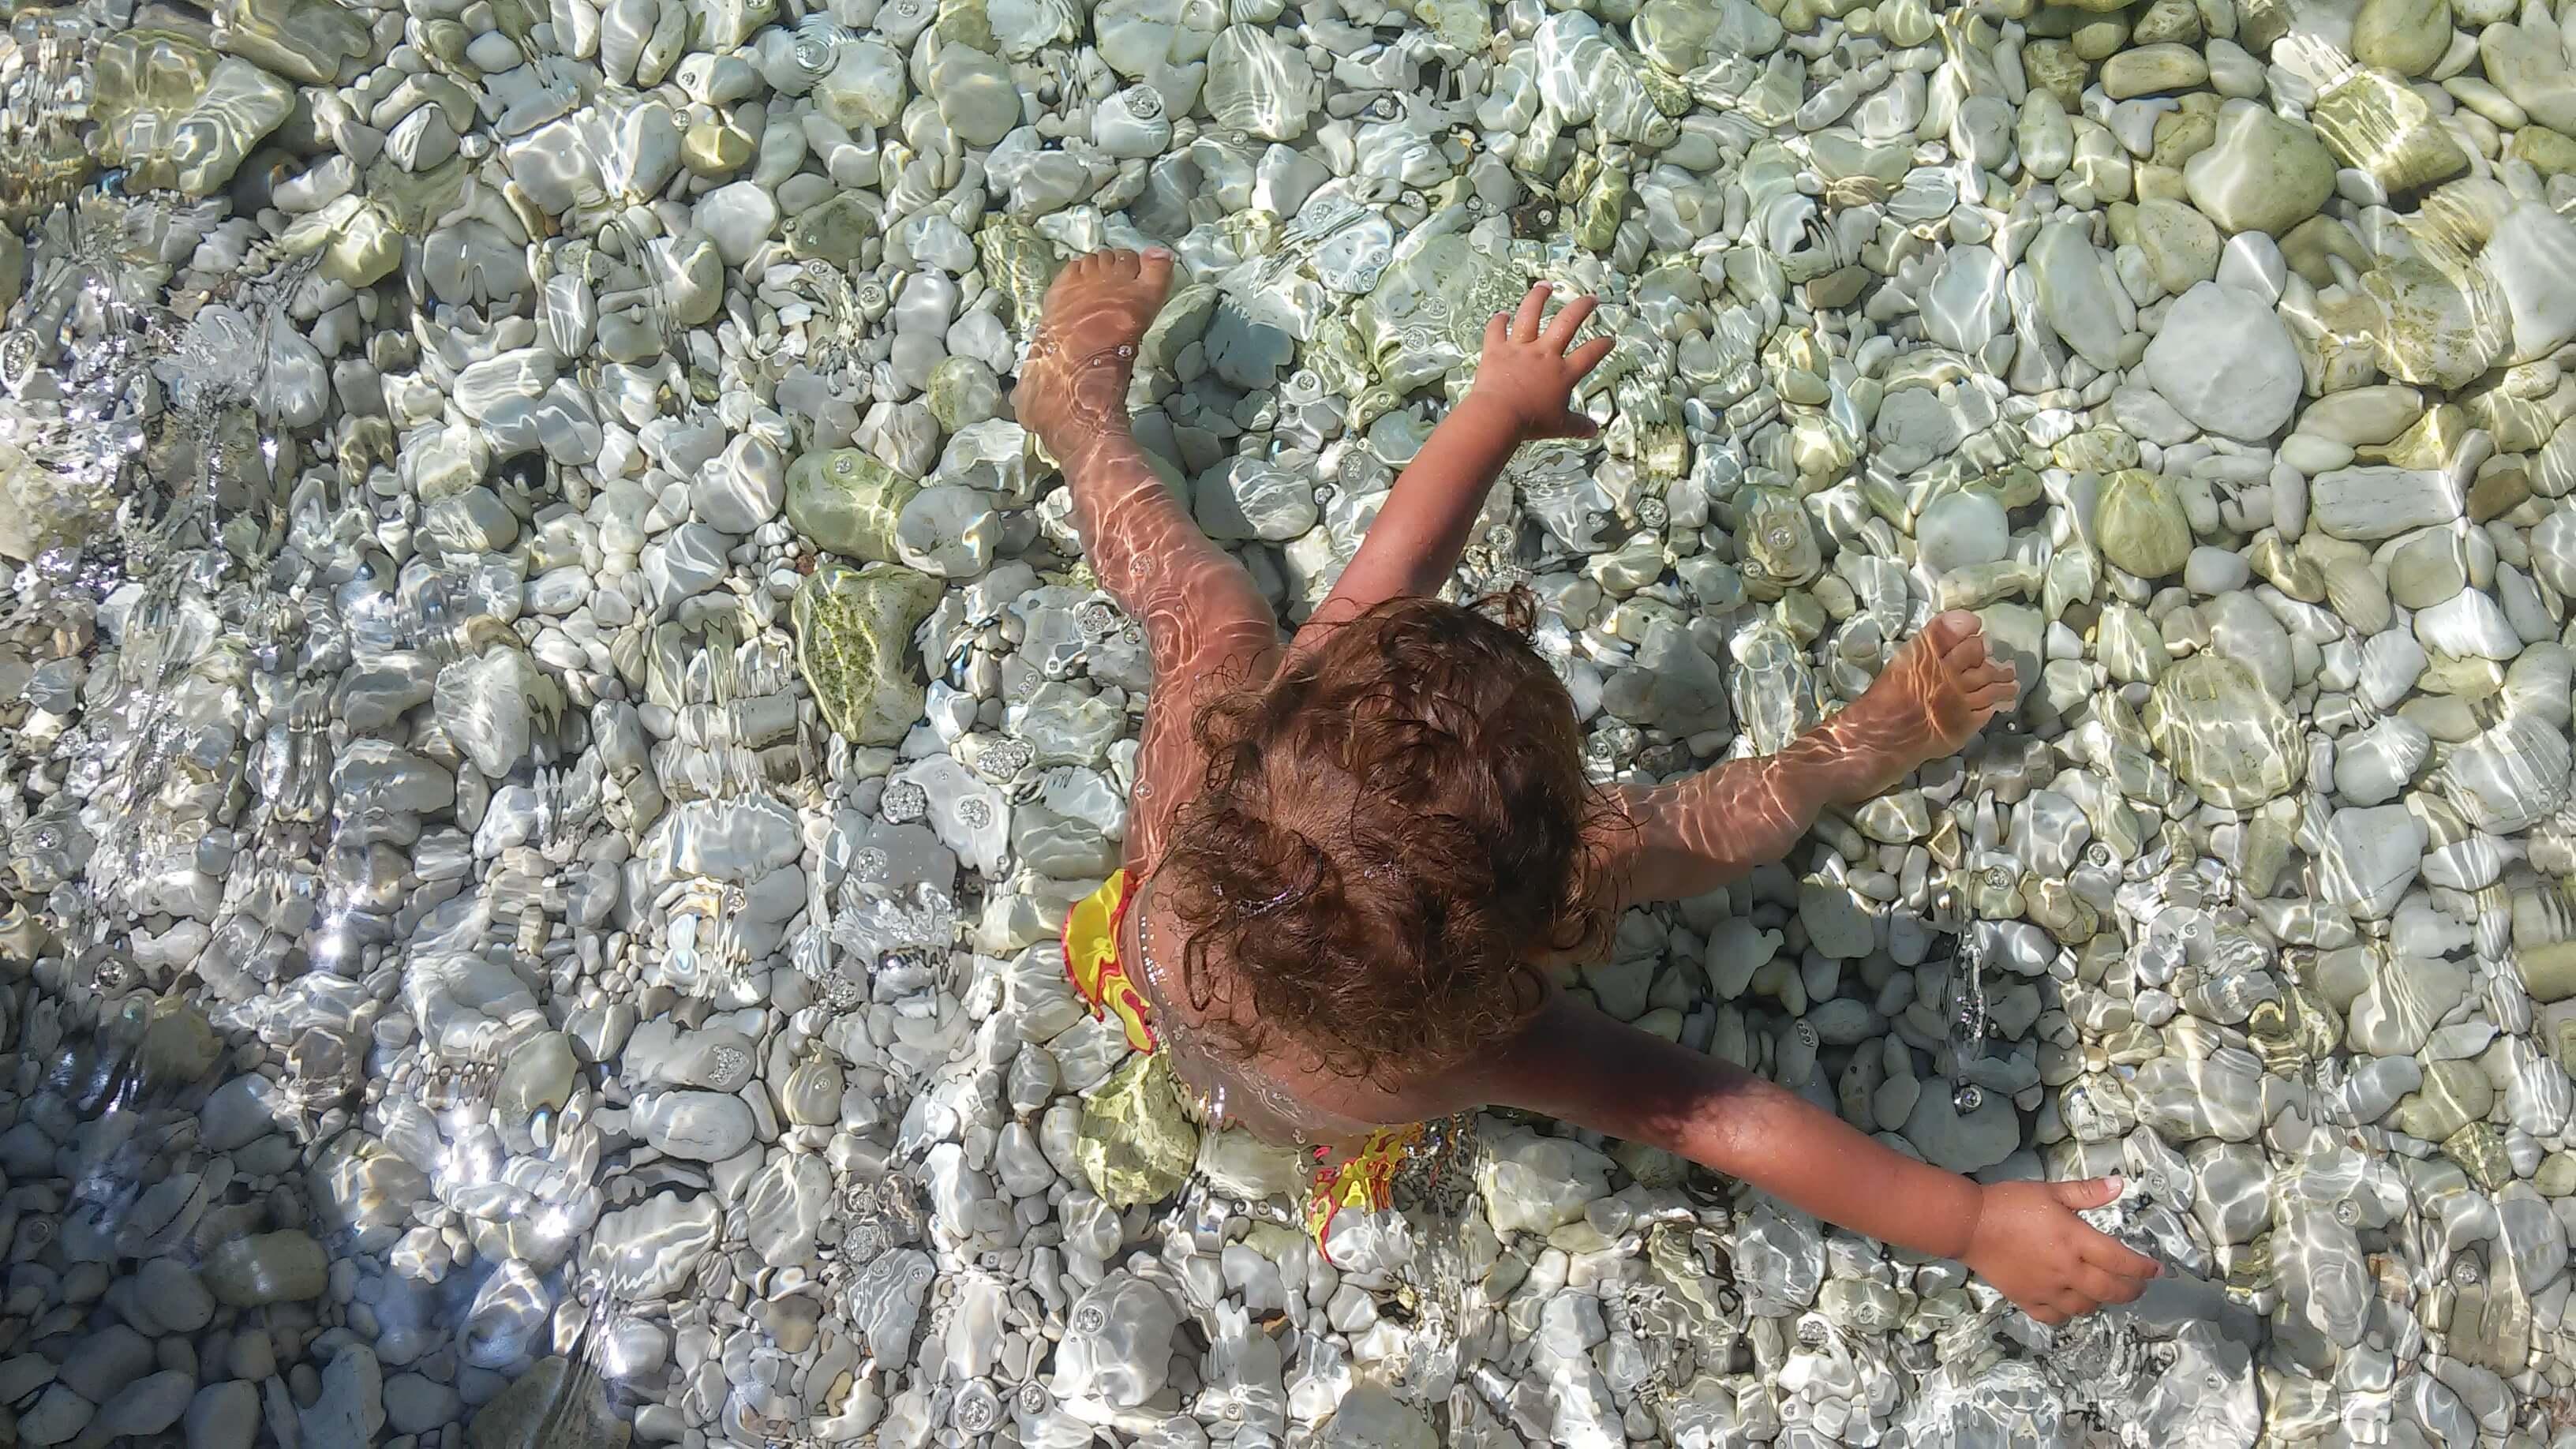 Albania bambini